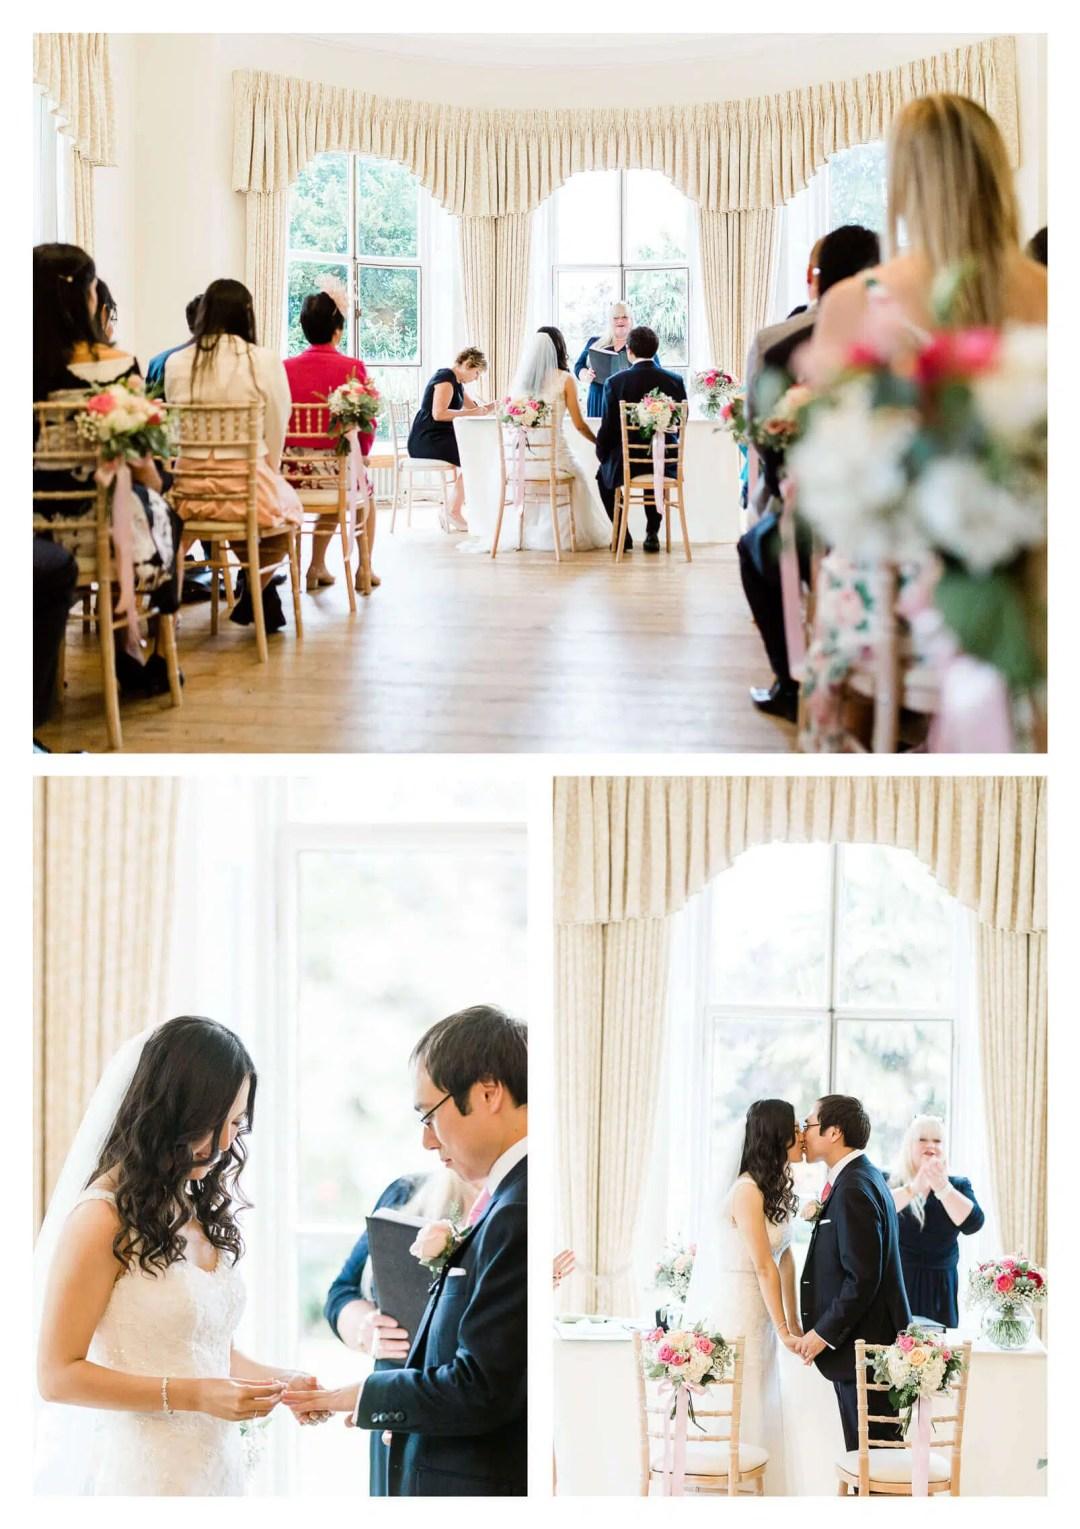 Cambridge Cottage wedding ceremony | Kew Gardens wedding photographer